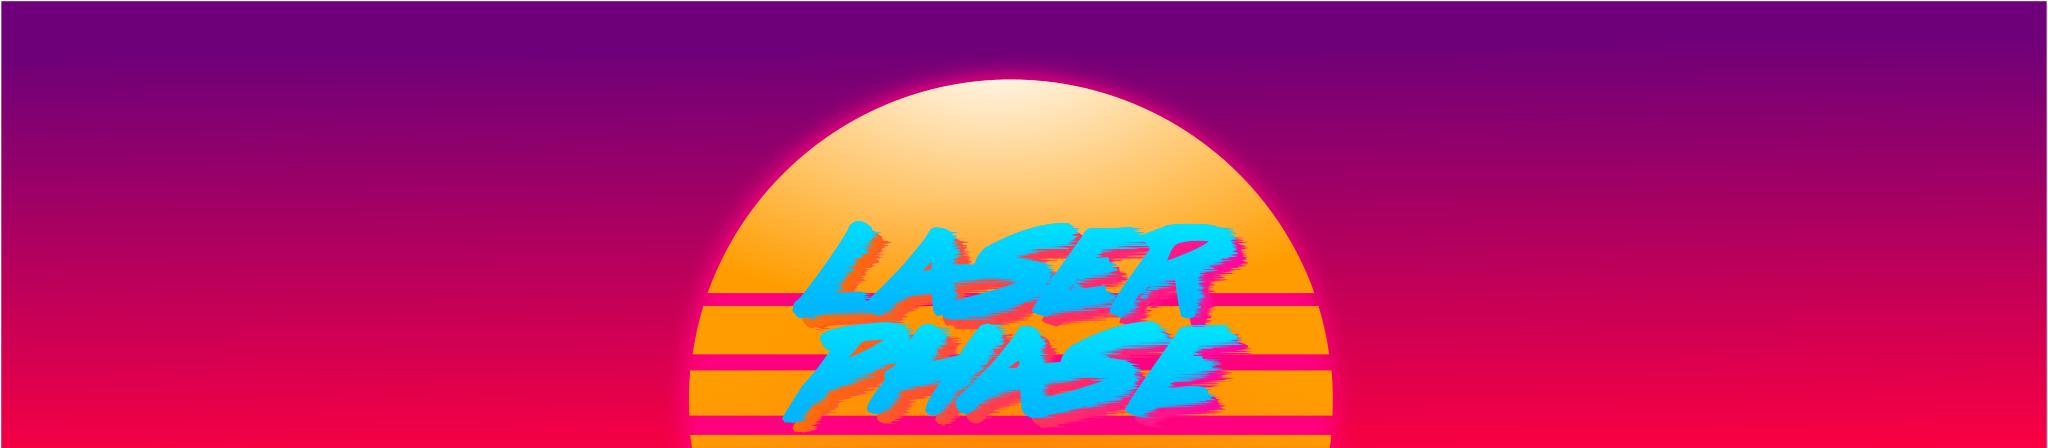 Laser Phase